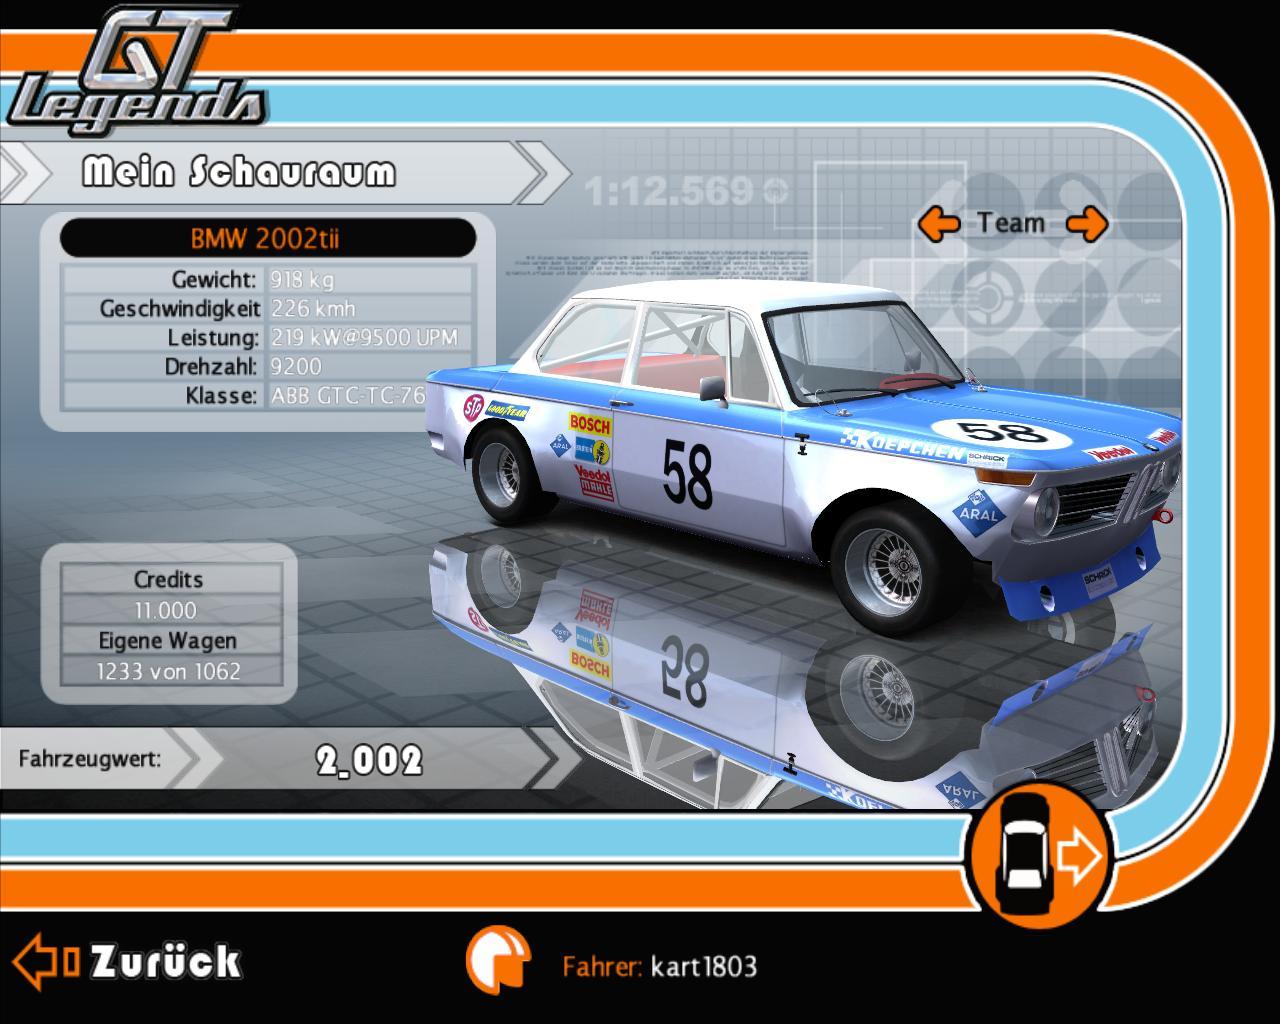 BMW 2002 Tii For Sale >> BMW 2002 Tii for GT Legends – Four New Previews – VirtualR.net – Sim Racing News